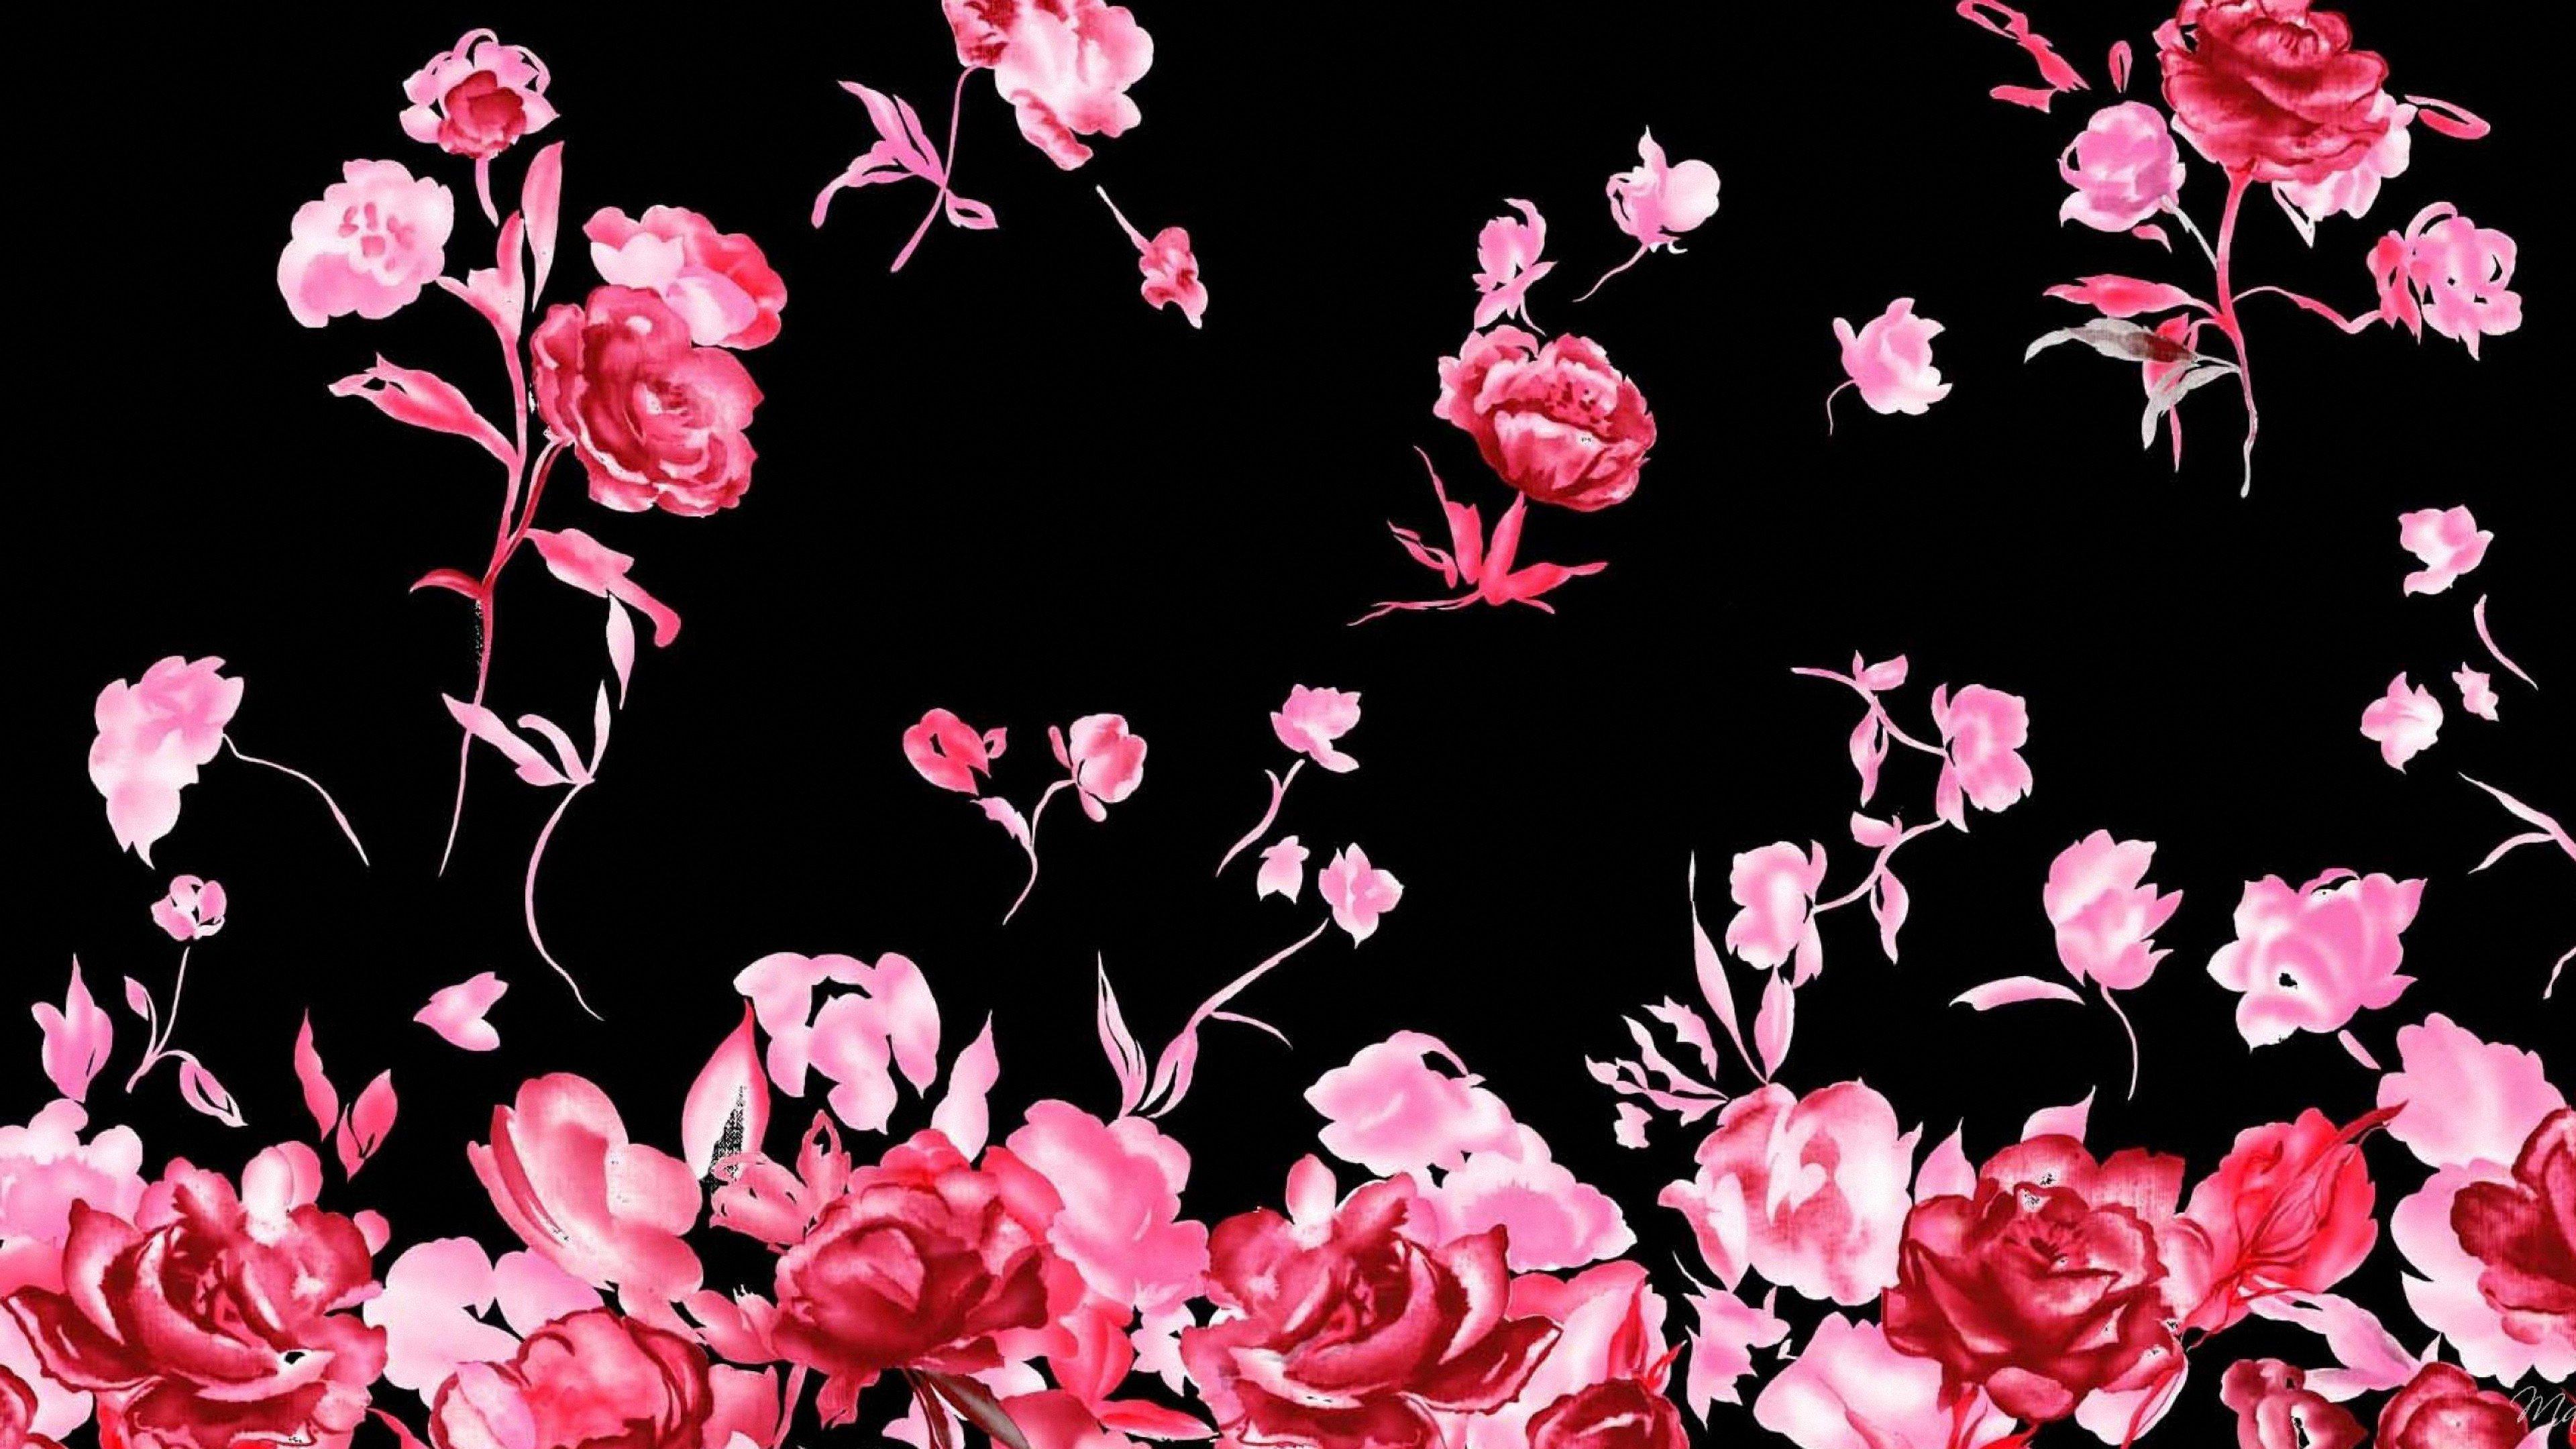 Фон На Телефон Цветы Обои